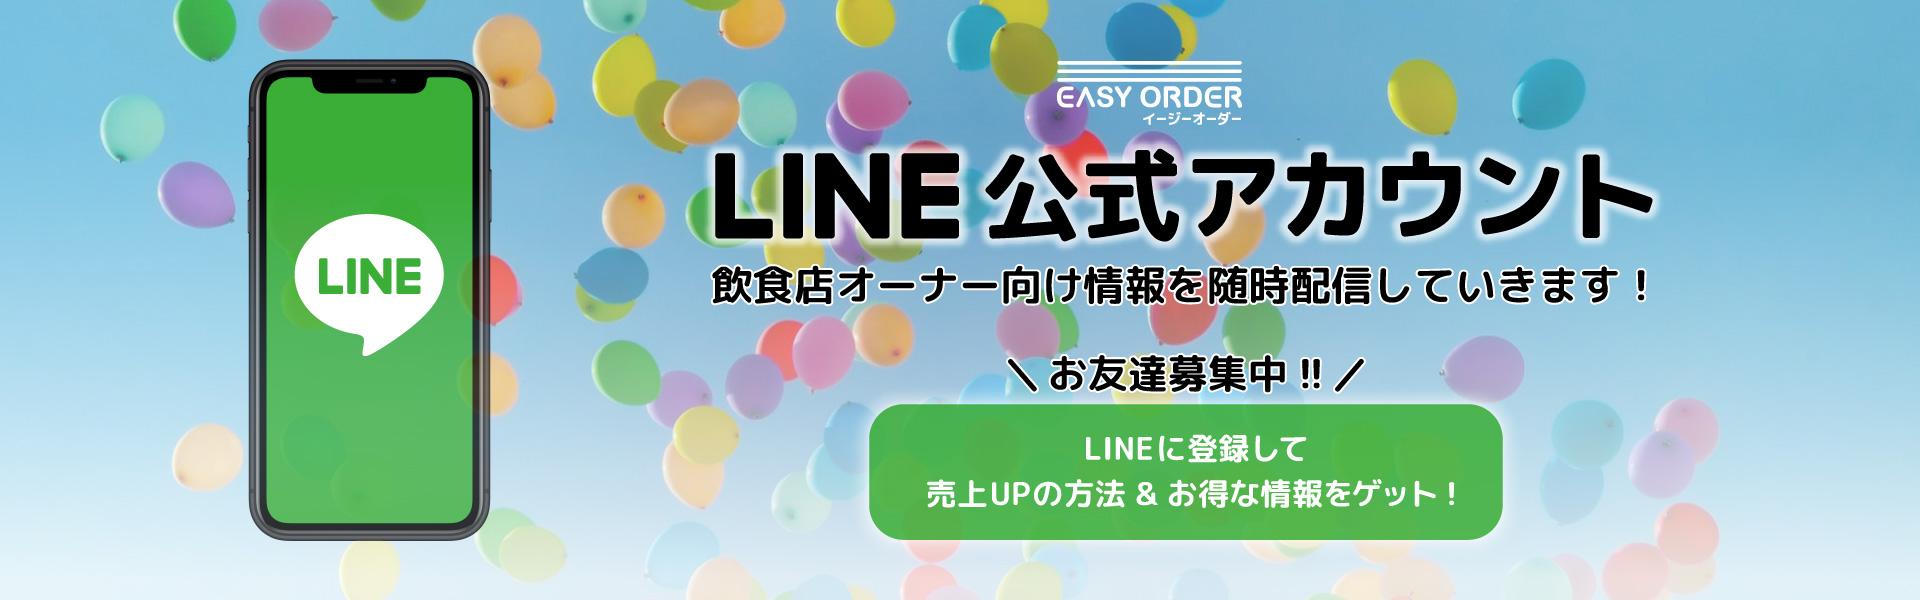 EASY ORDER - LINE公式アカウント | 登録して売上UPの方法&お得な情報をゲット!